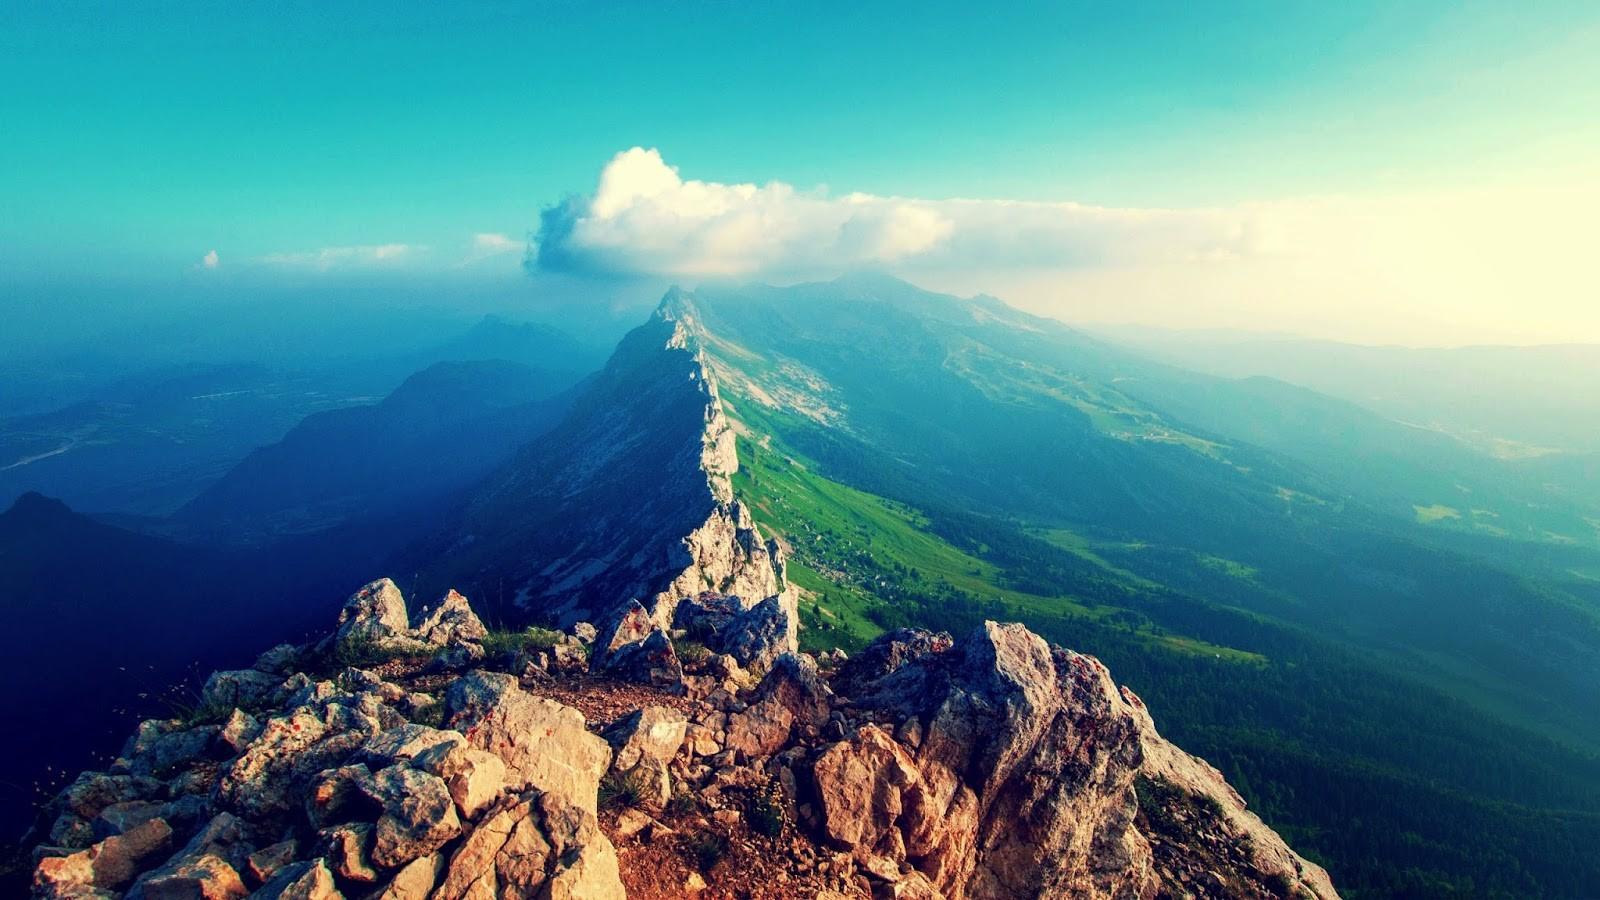 nature mountains landscape sky 211366